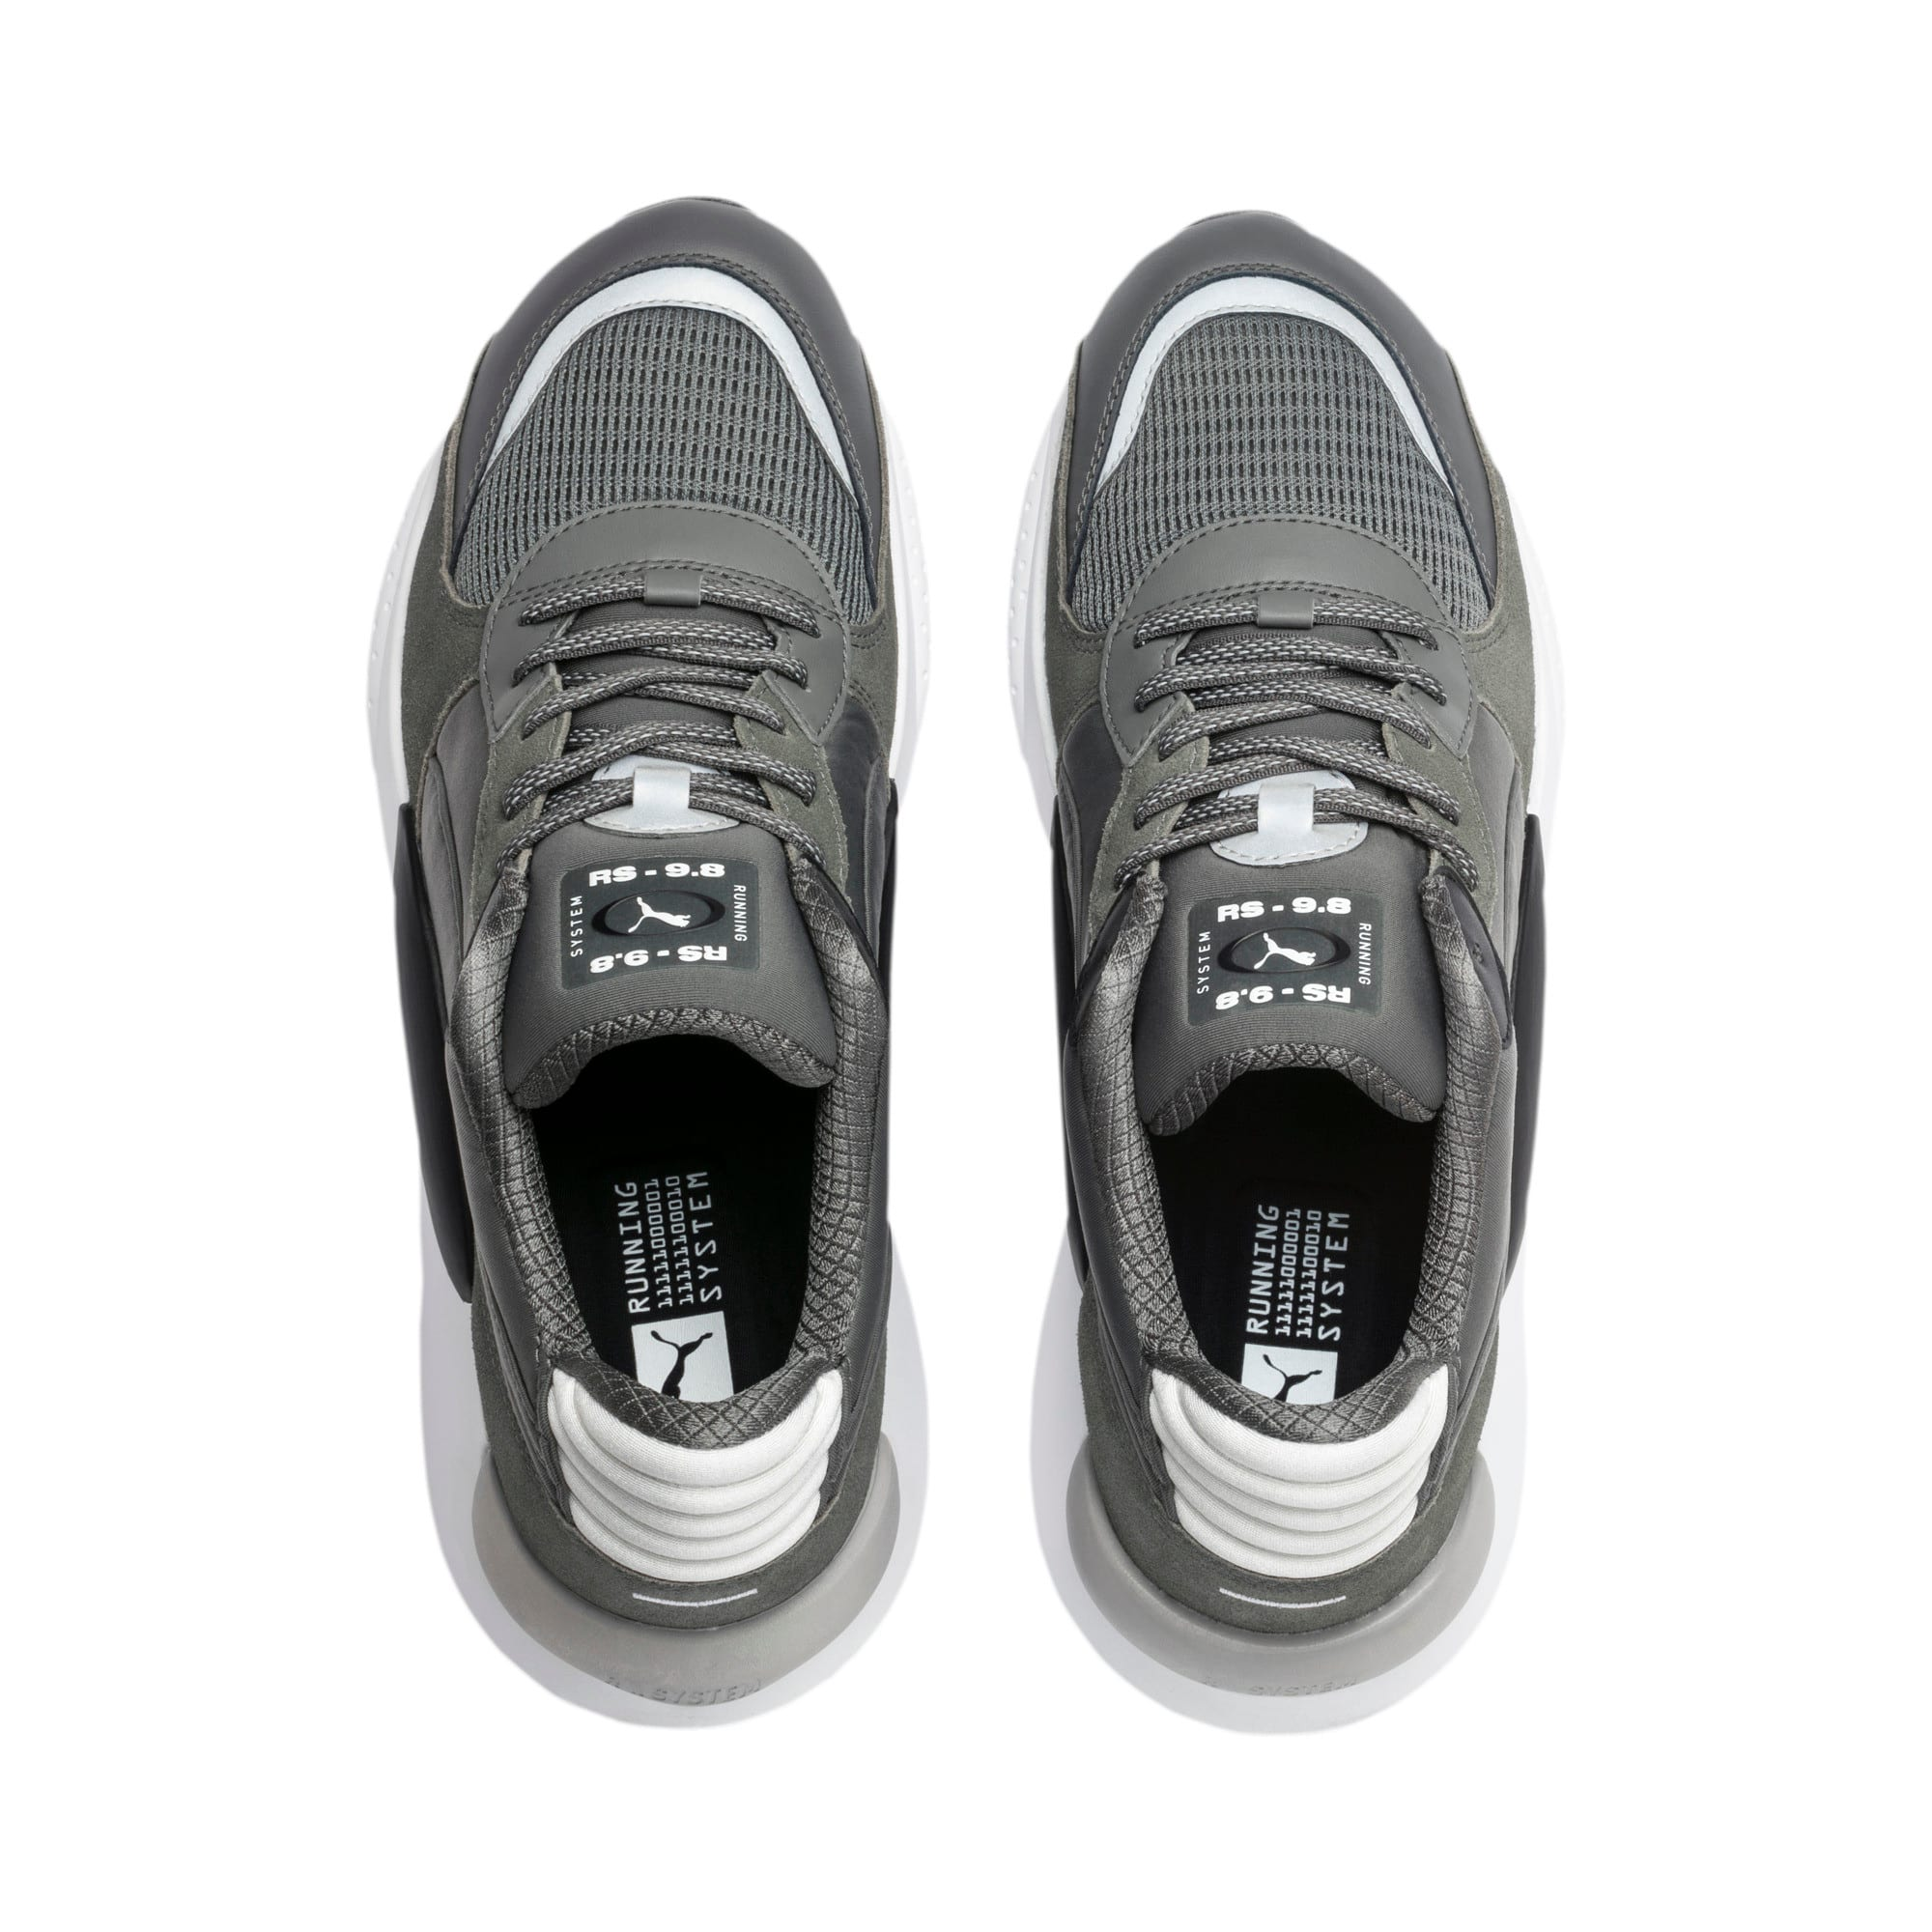 Thumbnail 6 of RS 9.8 Gravity Sneakers, CASTLEROCK-Puma Black, medium